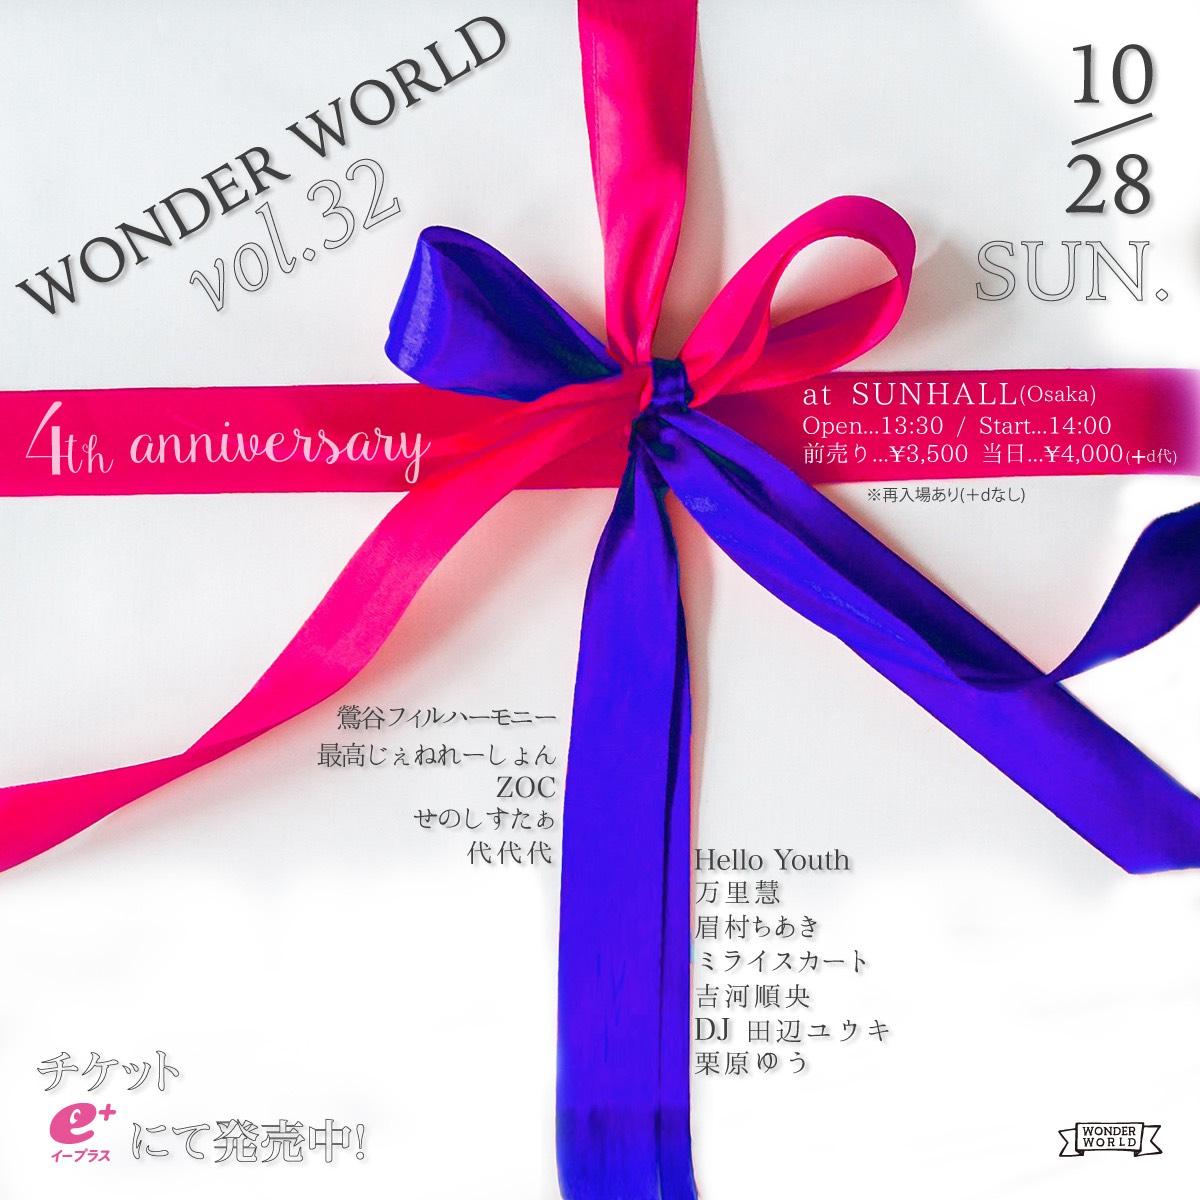 「WONDER WORLD vol.32」~4周年~